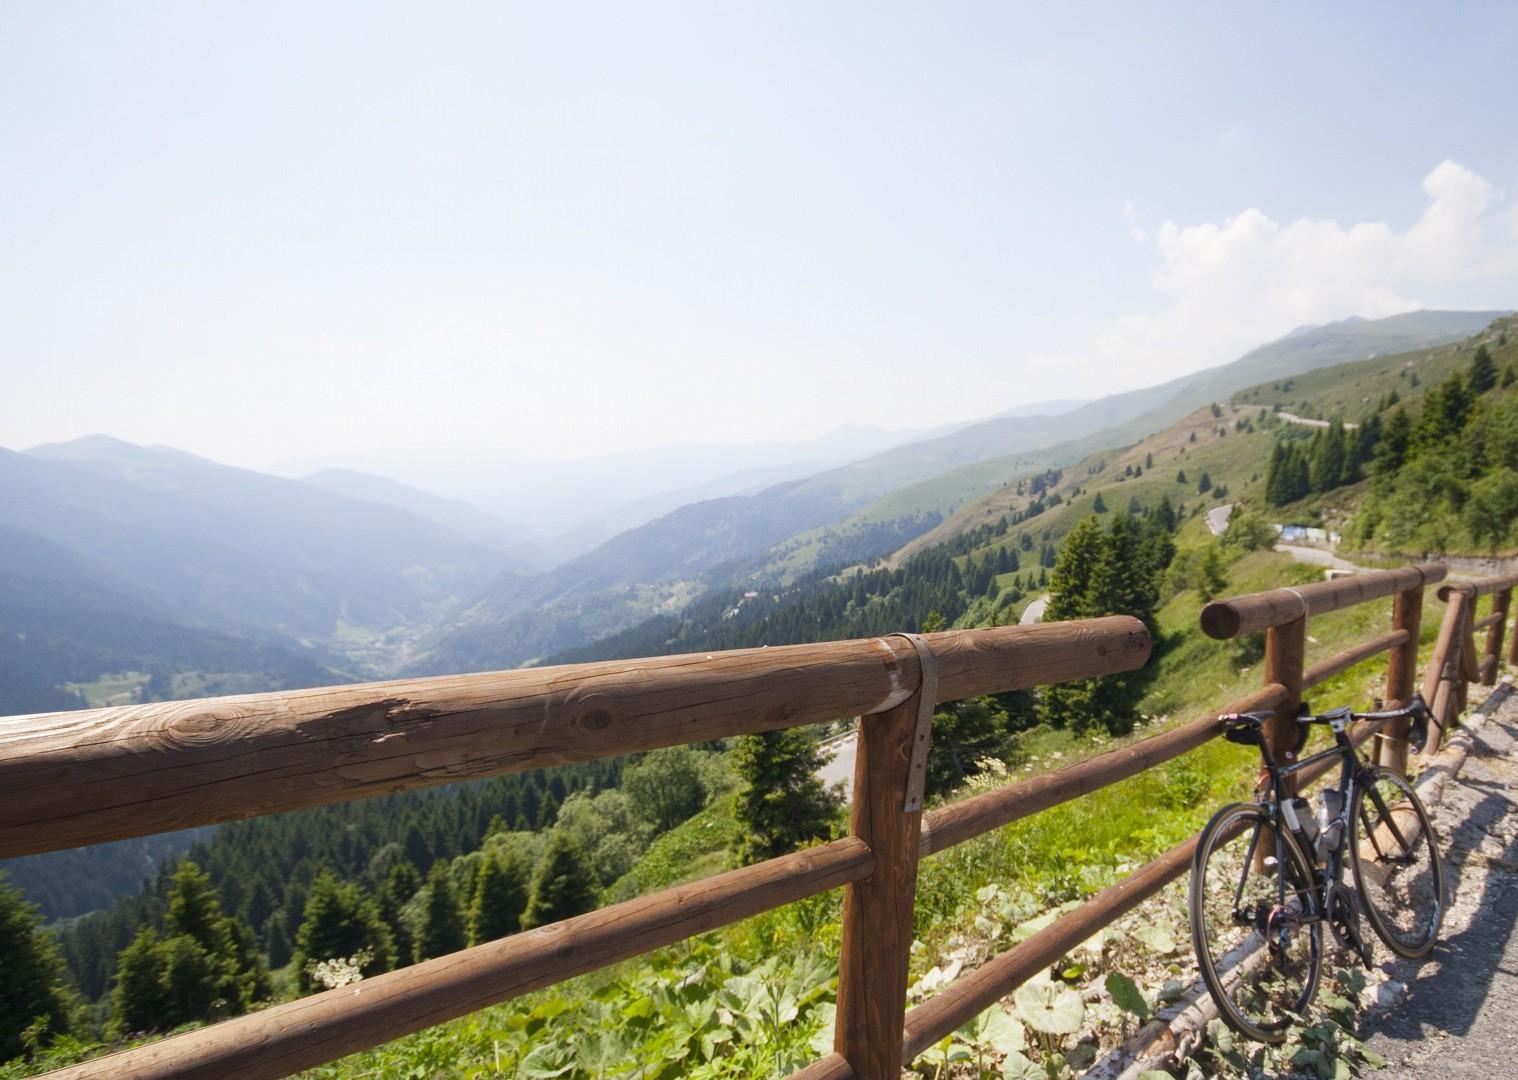 lombardia12.jpg - Italy - Lakes of Lombardia - Guided Road Cycling Holiday - Italia Road Cycling